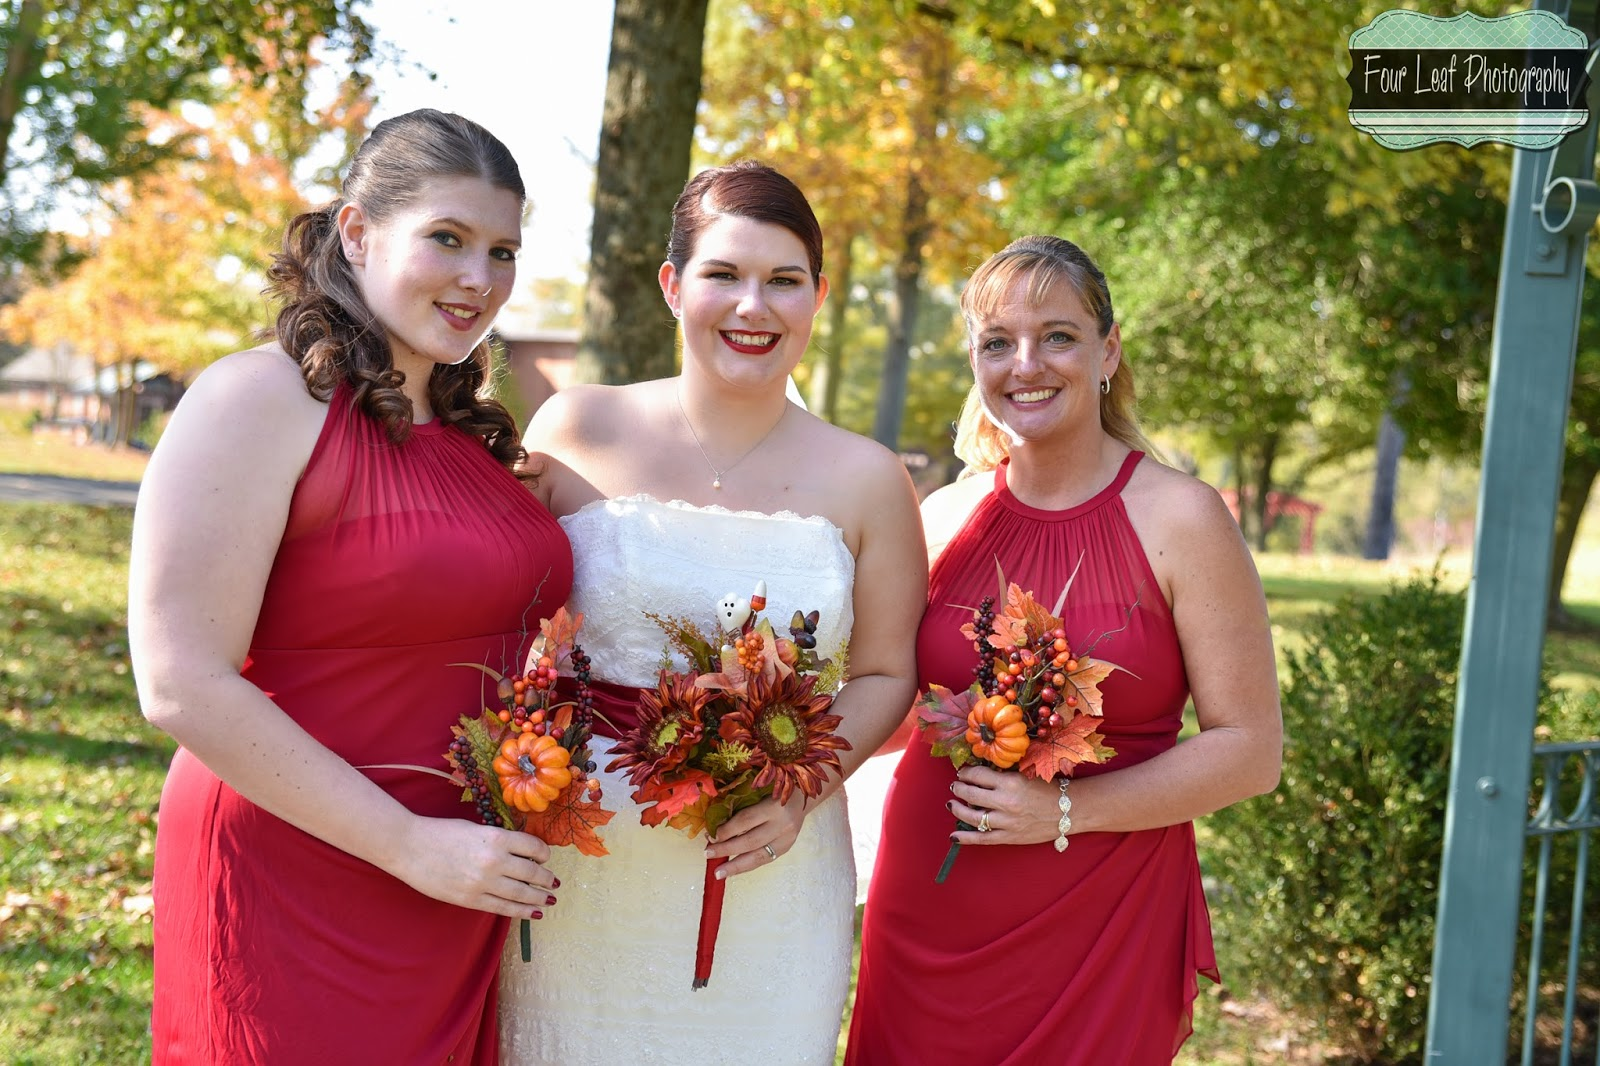 Four Leaf Photography - Louisville Wedding Photographer: October 2014